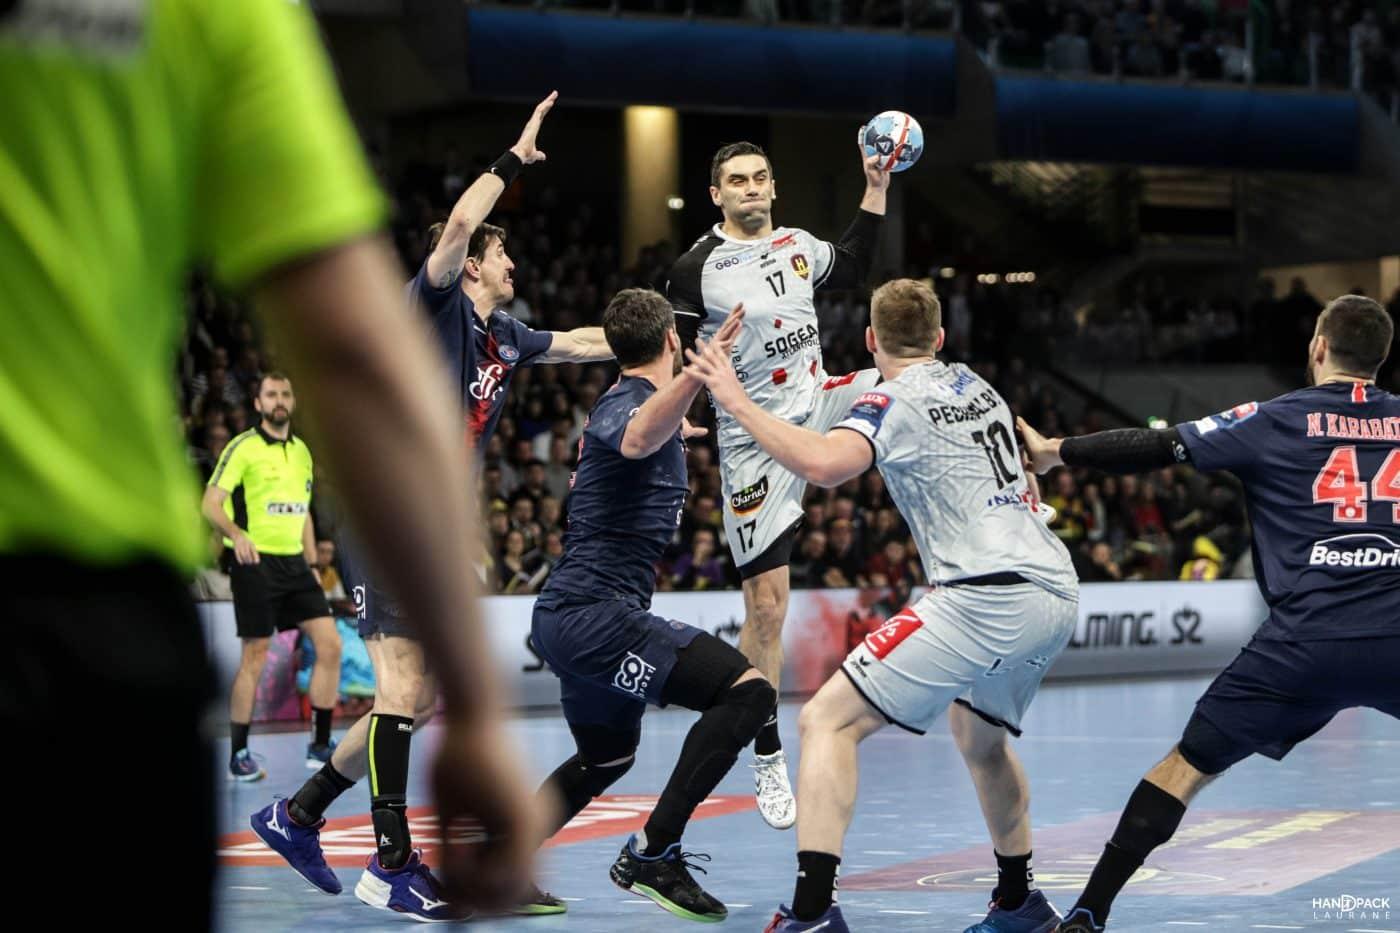 hbc-nantes-paris-saint-germain-handball-ligue-des-champions-2019-handpack-26